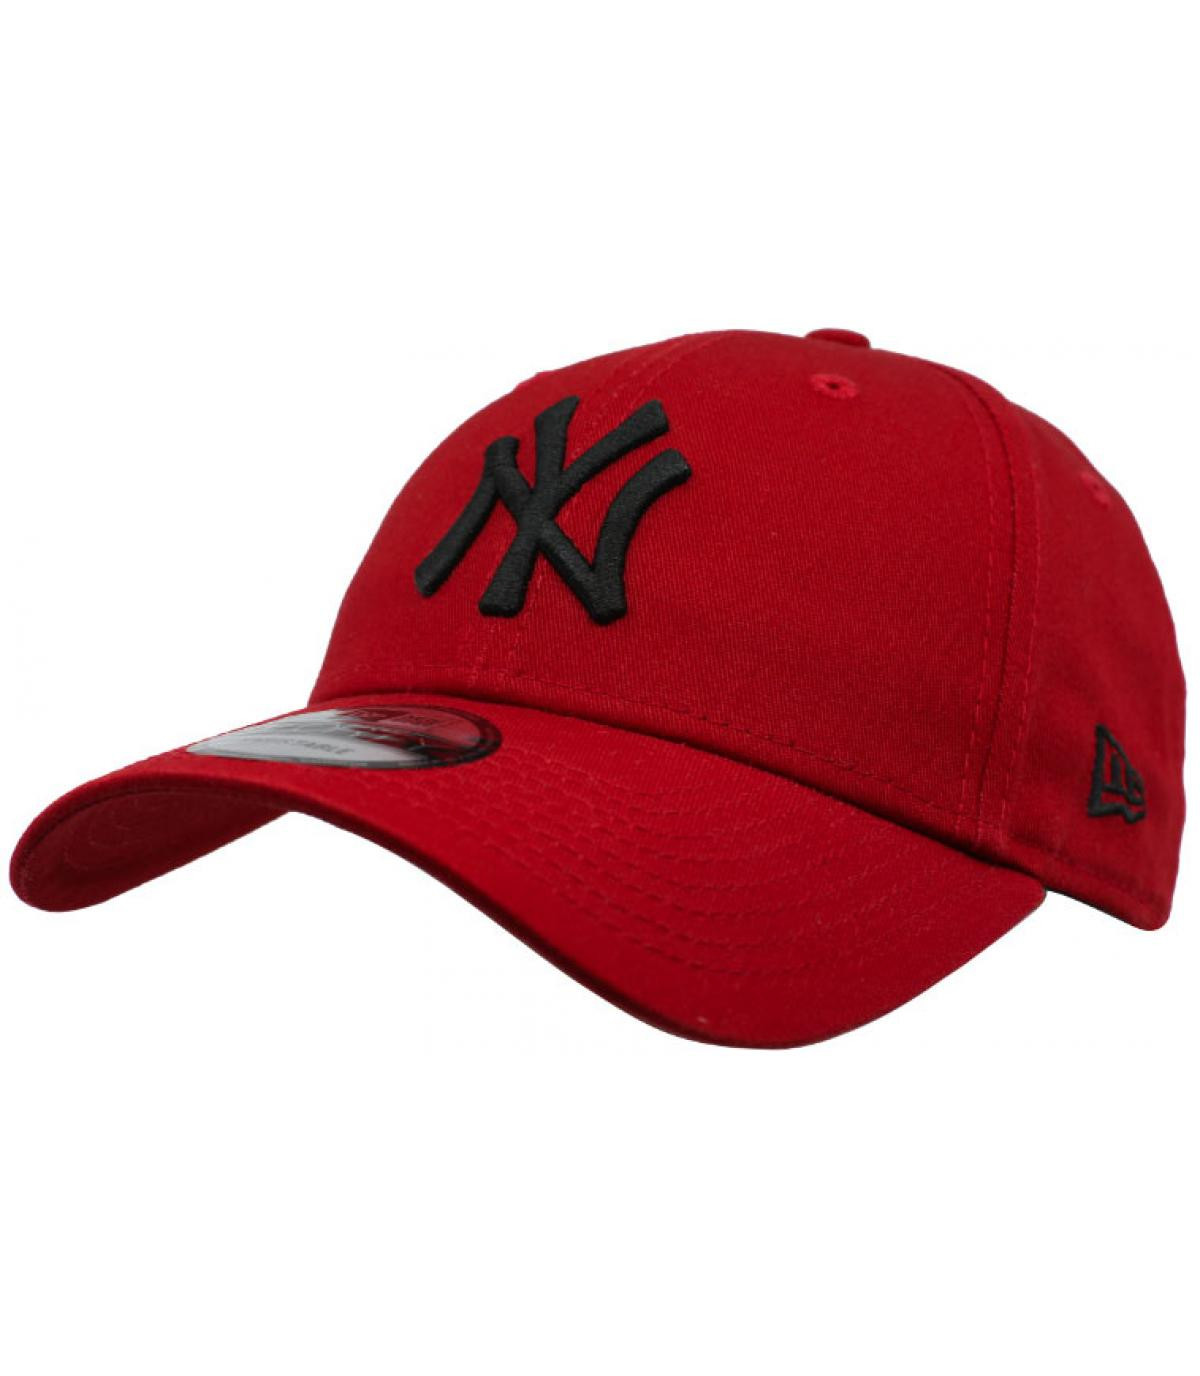 Détails League Ess NY 9Forty hot red black - image 2